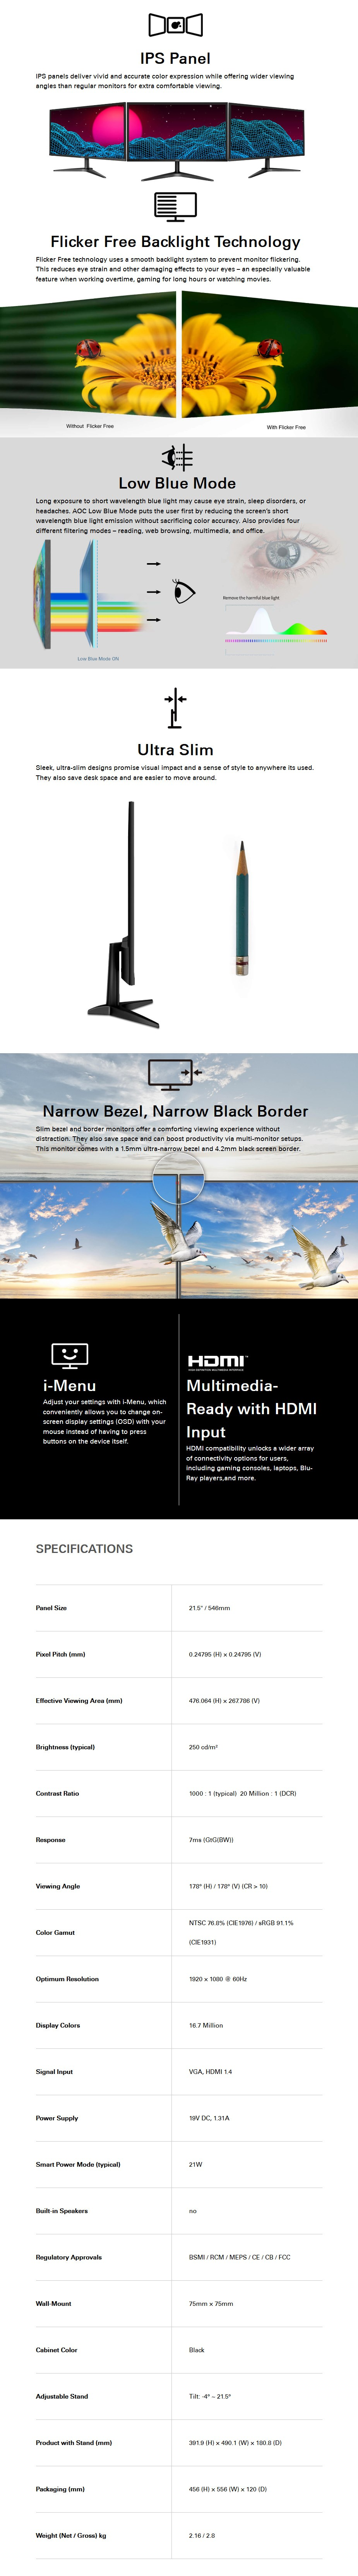 aoc-22b1hs75-215-full-hd-ips-monitor-ac16603-7.jpg